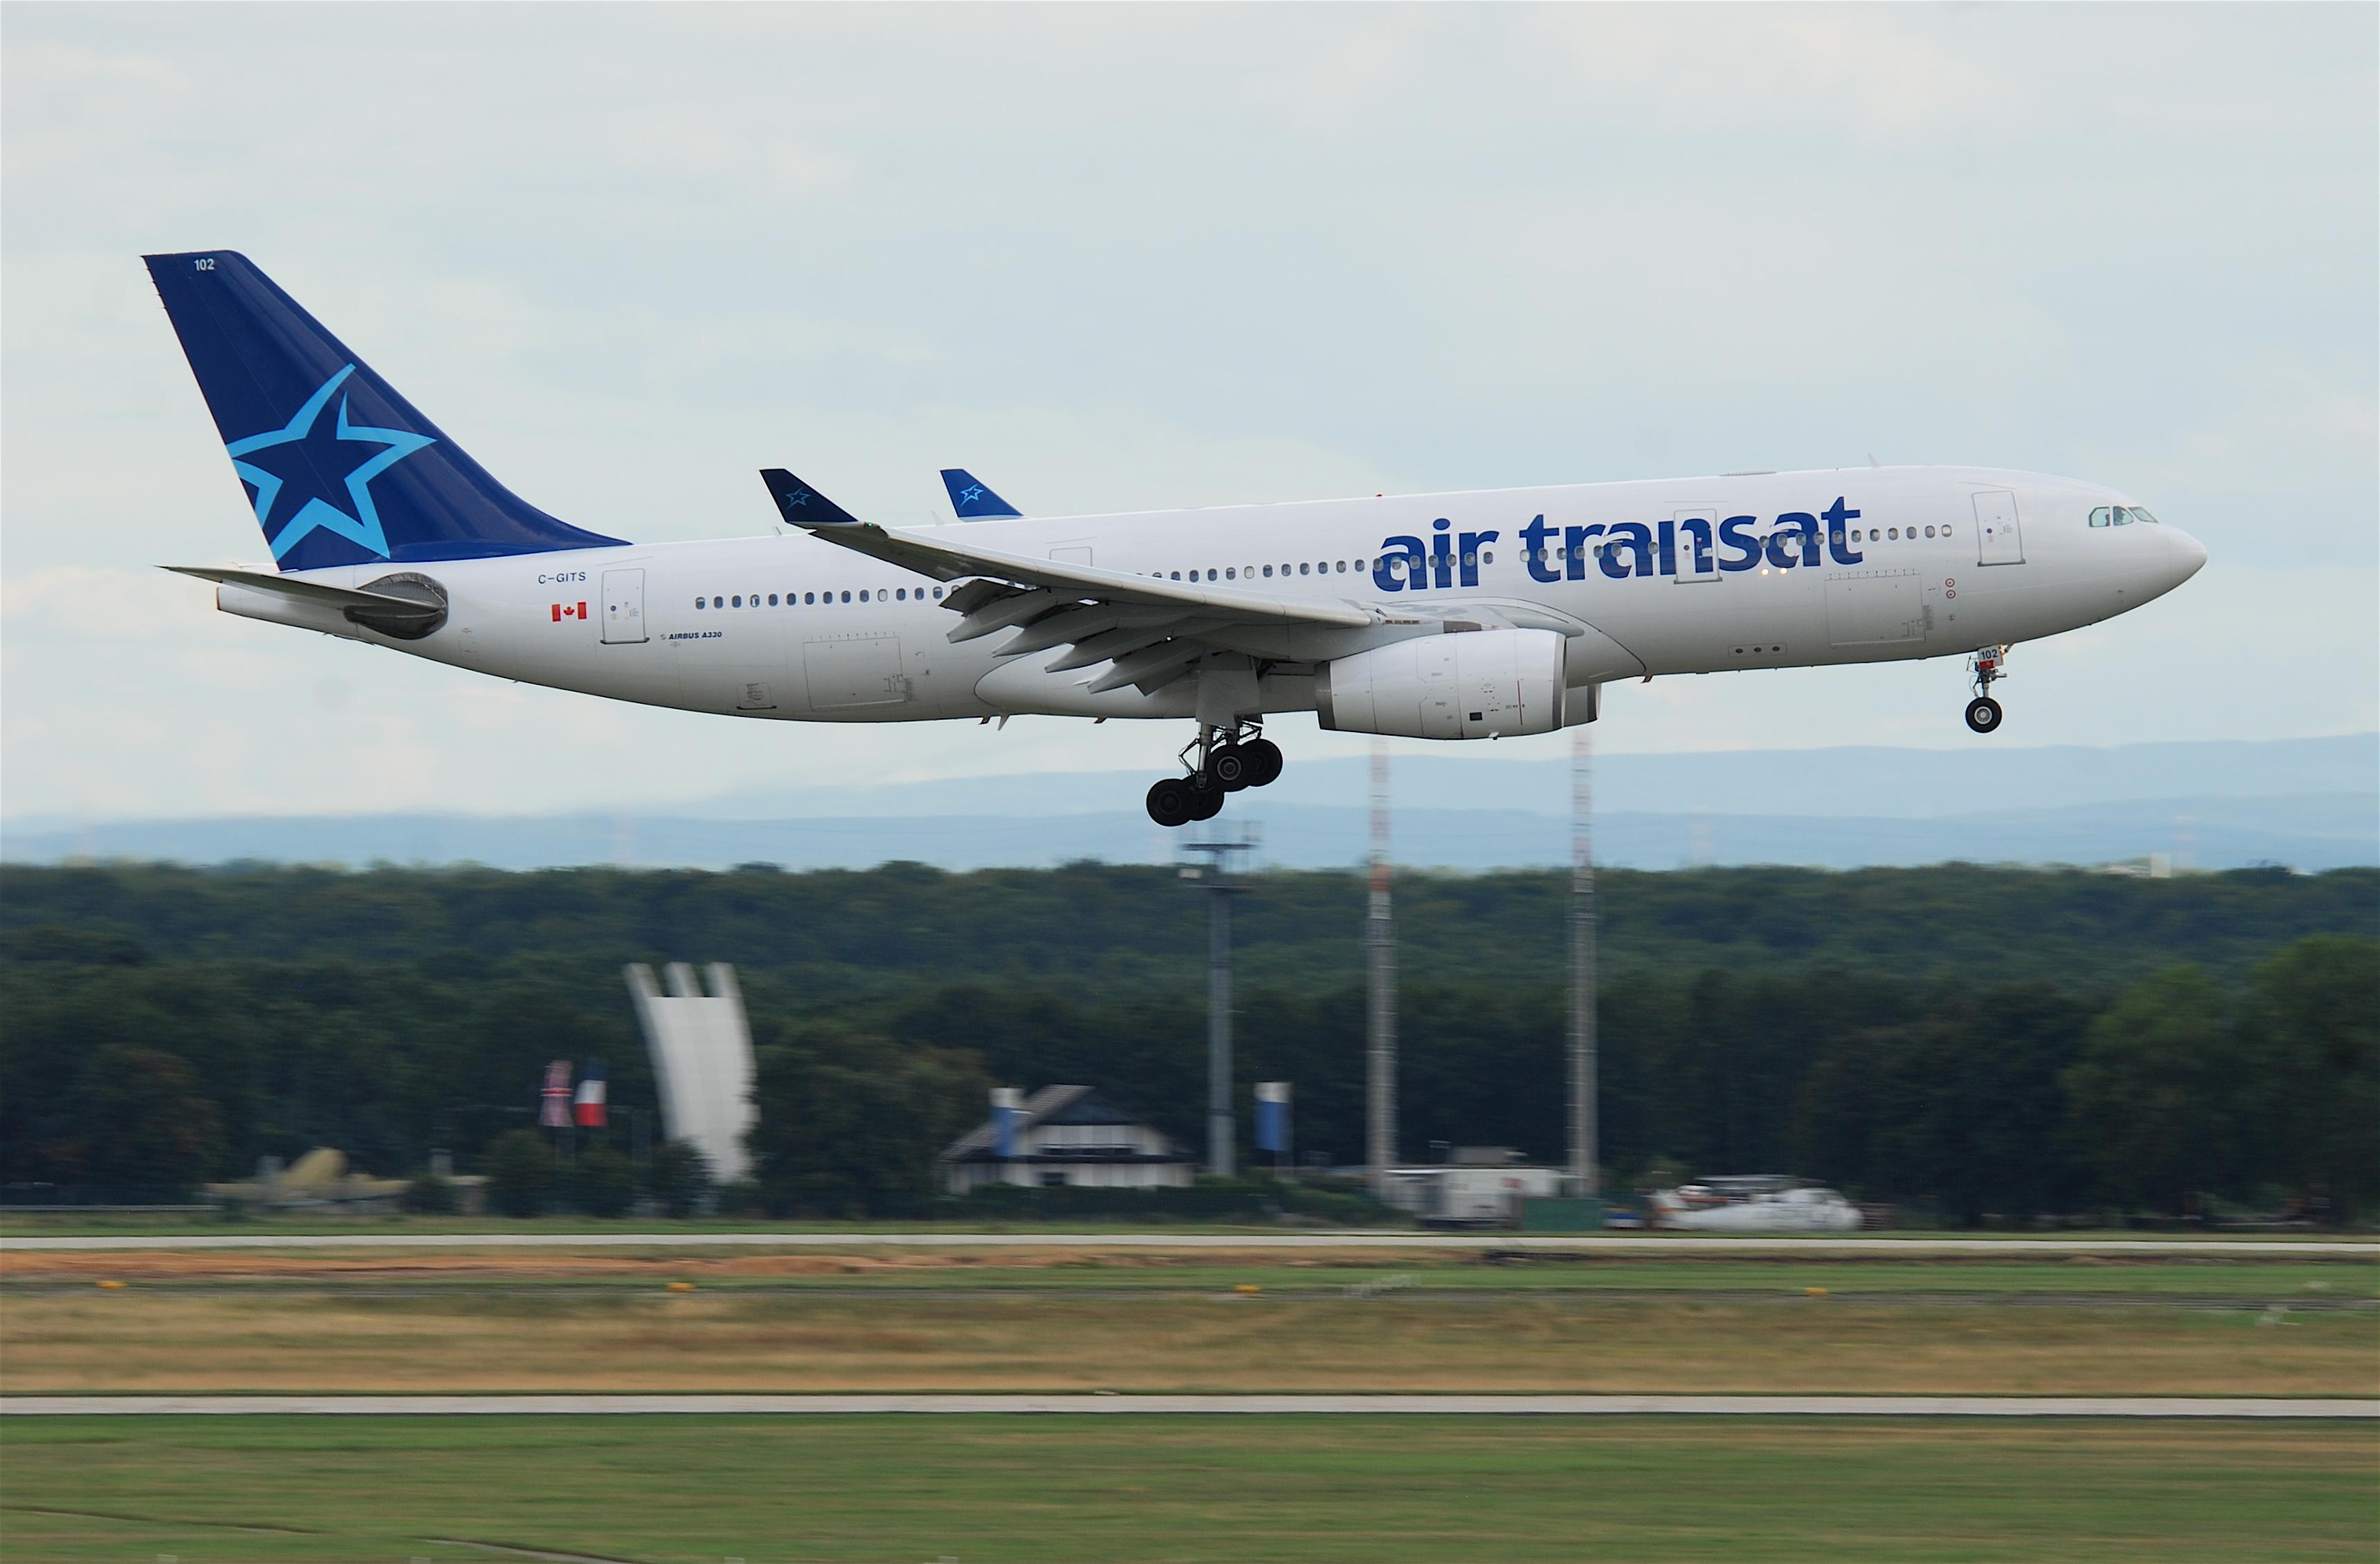 file air transat airbus a330 200 c gits fra 08 08 2010 585dc 4878975540 jpg wikimedia commons